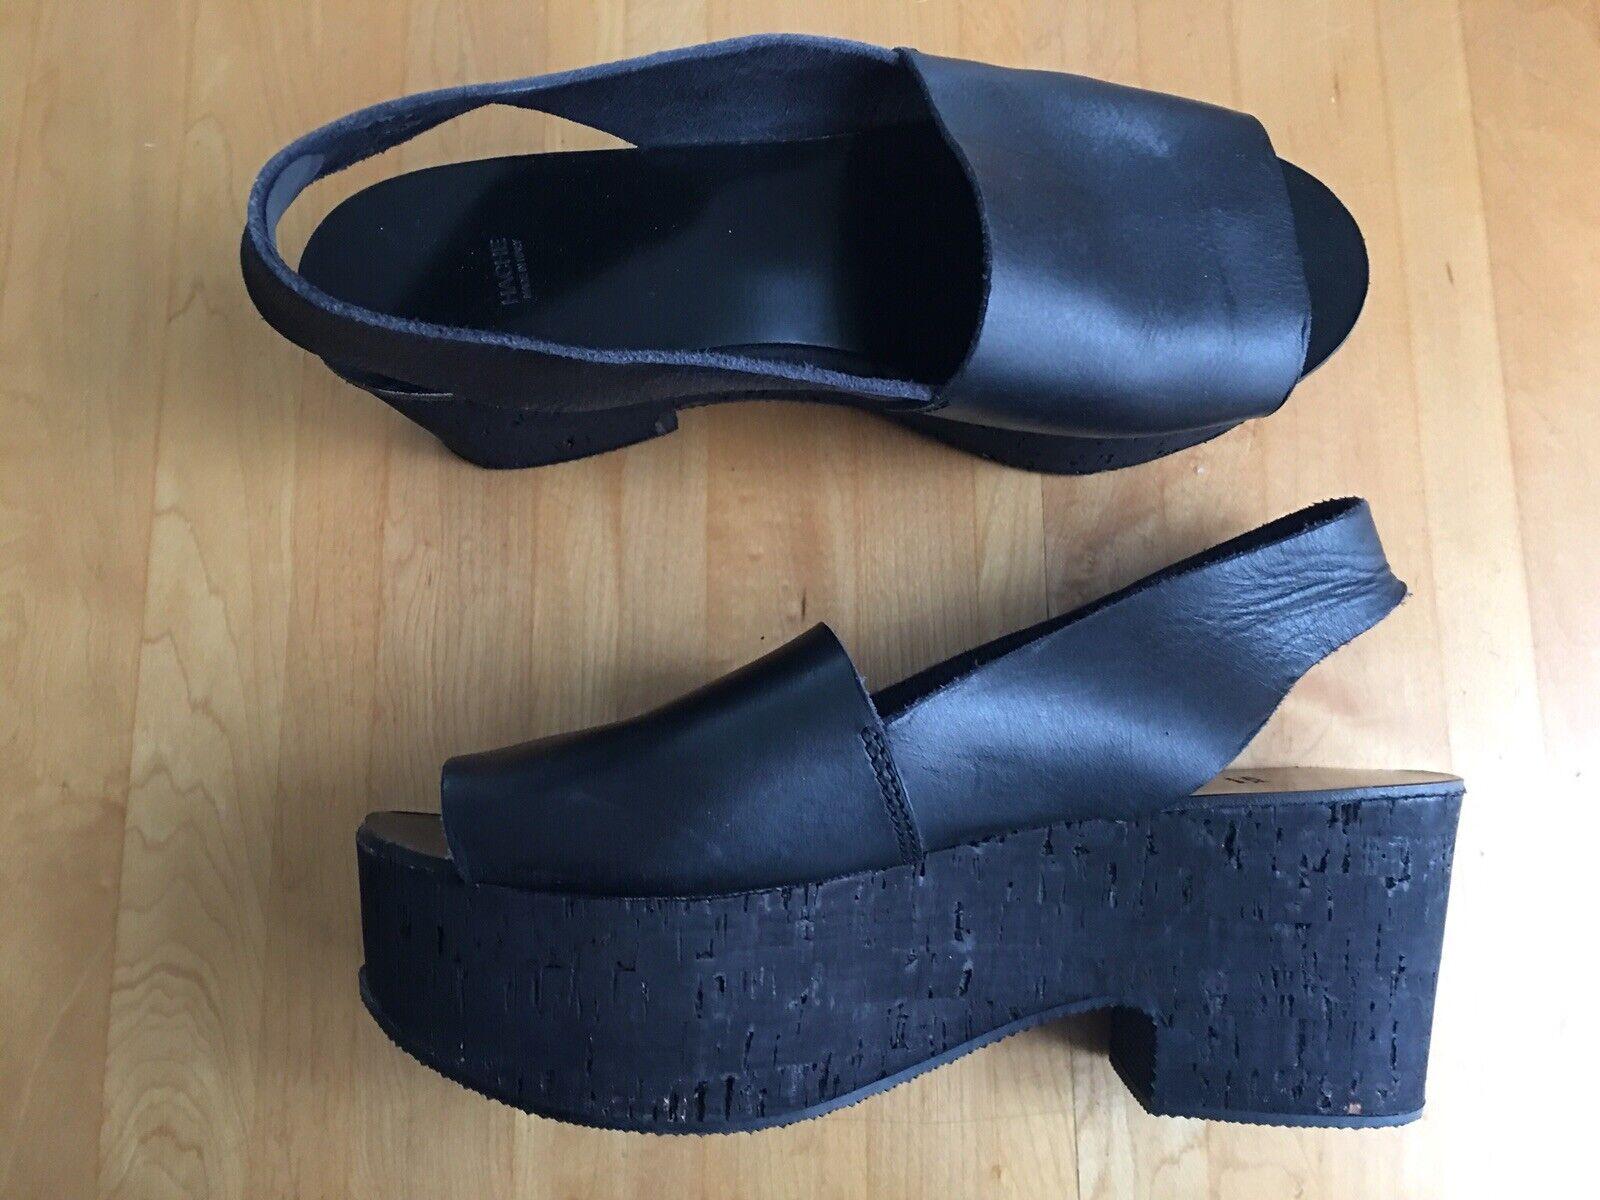 Hache Italian black leather flatform sandals with cork soles, 40 U.S. 10